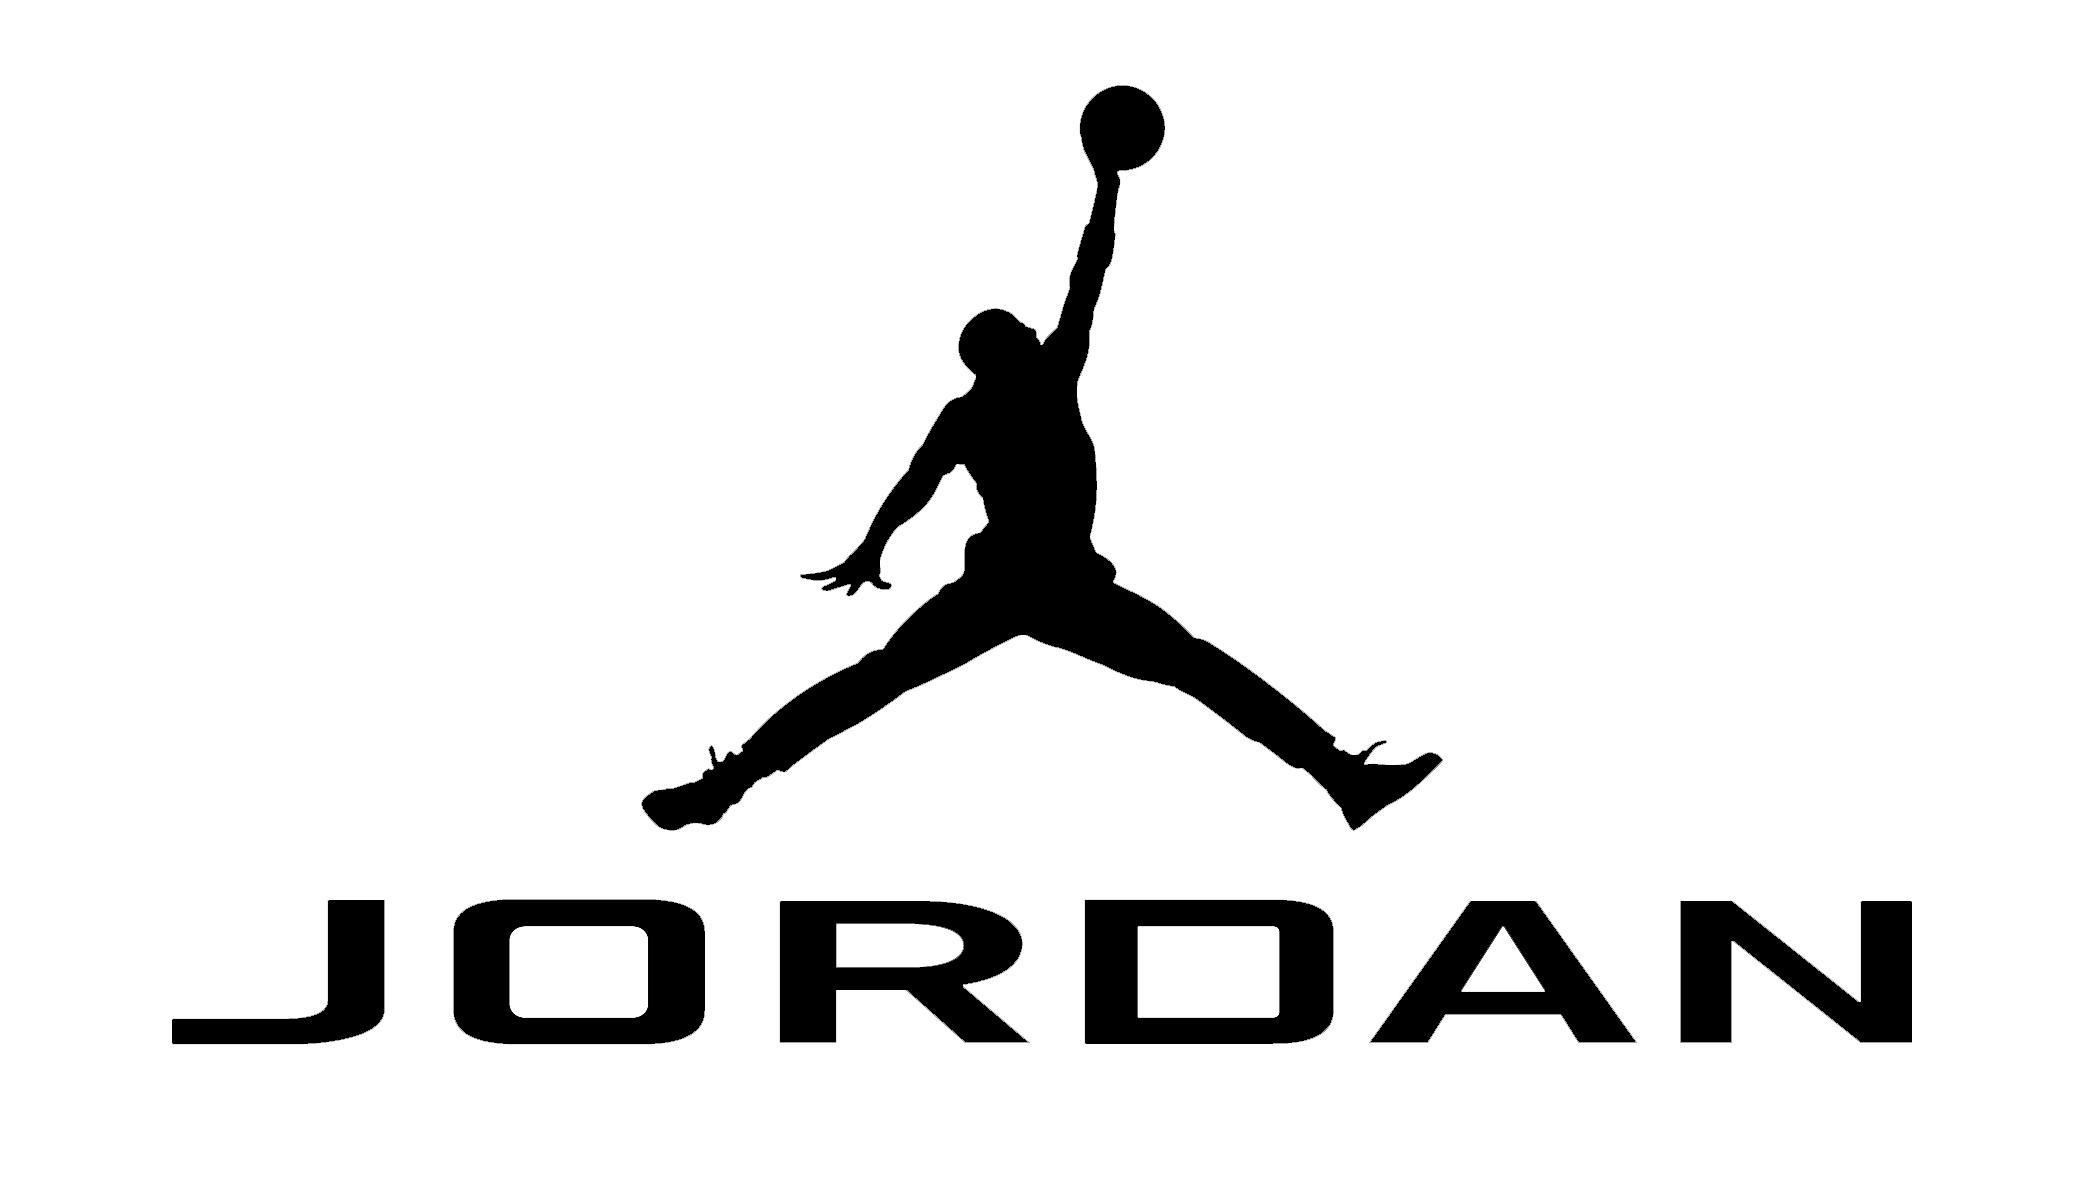 10 New Michael Jordan Logo Wallpaper FULL HD 1080p For PC Background 2018 Free Download